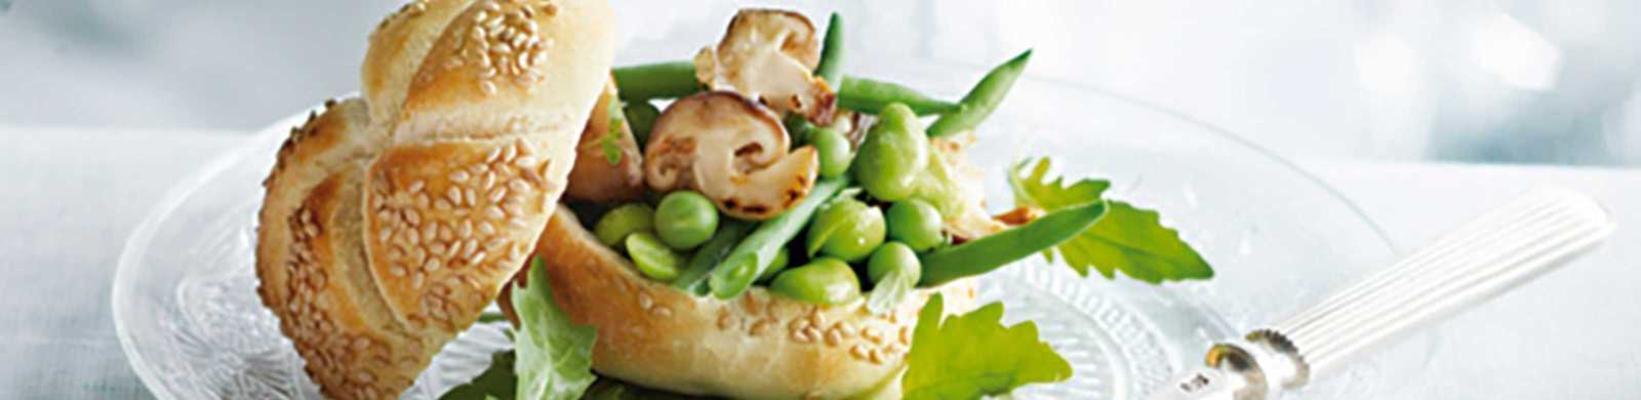 mushroom ball with green vegetables